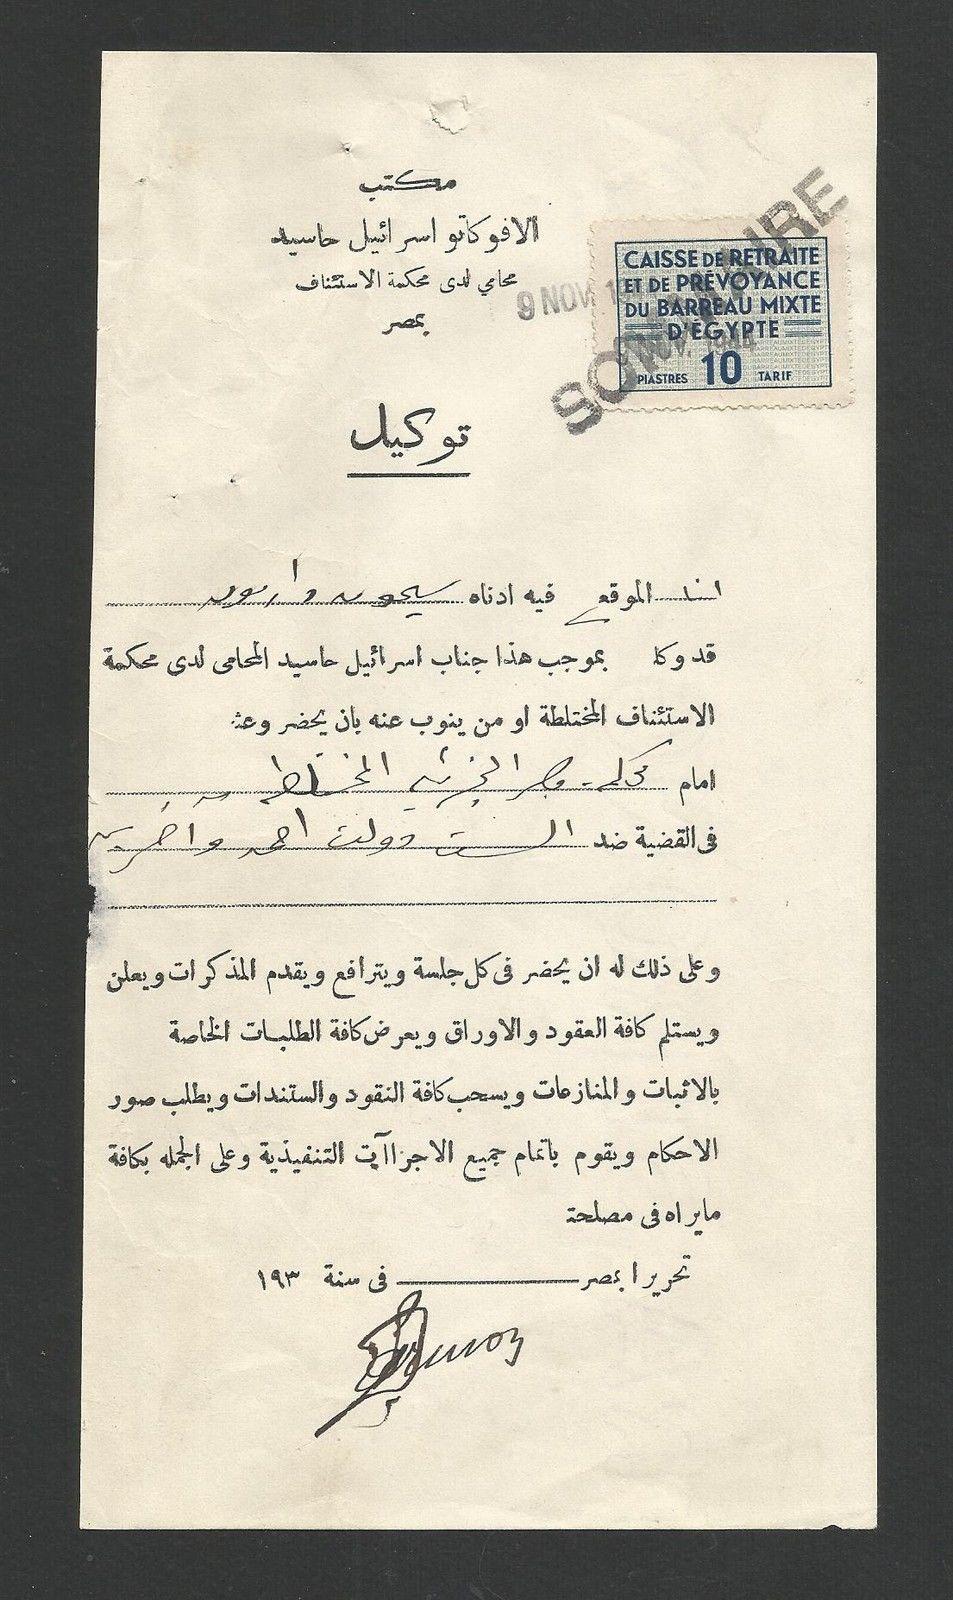 Egyp 1932 Pension Revenues 10pt Foreigner Lawers رابطه صندوق المحامين الاجانب Egyptian History Egypt History Old Egypt